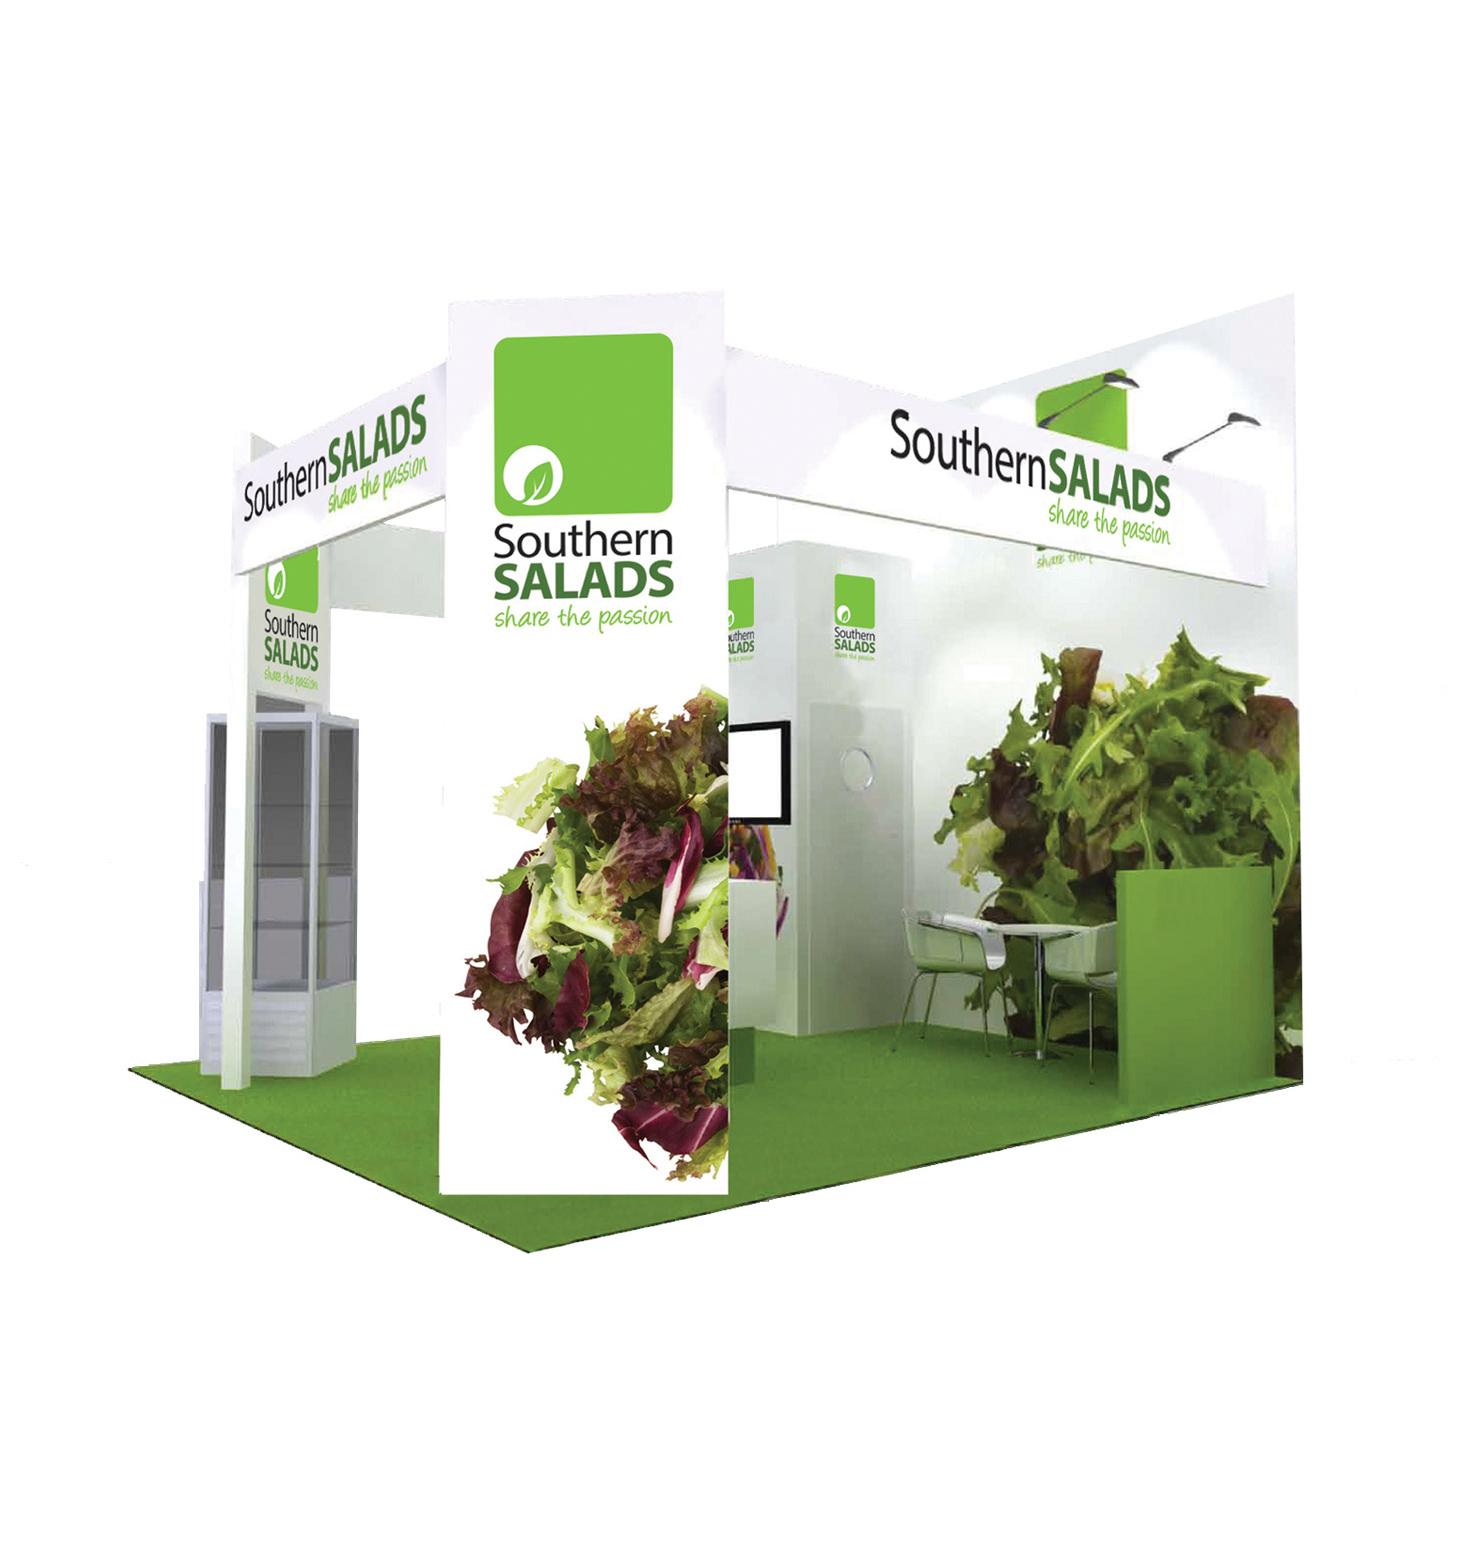 Southern salads